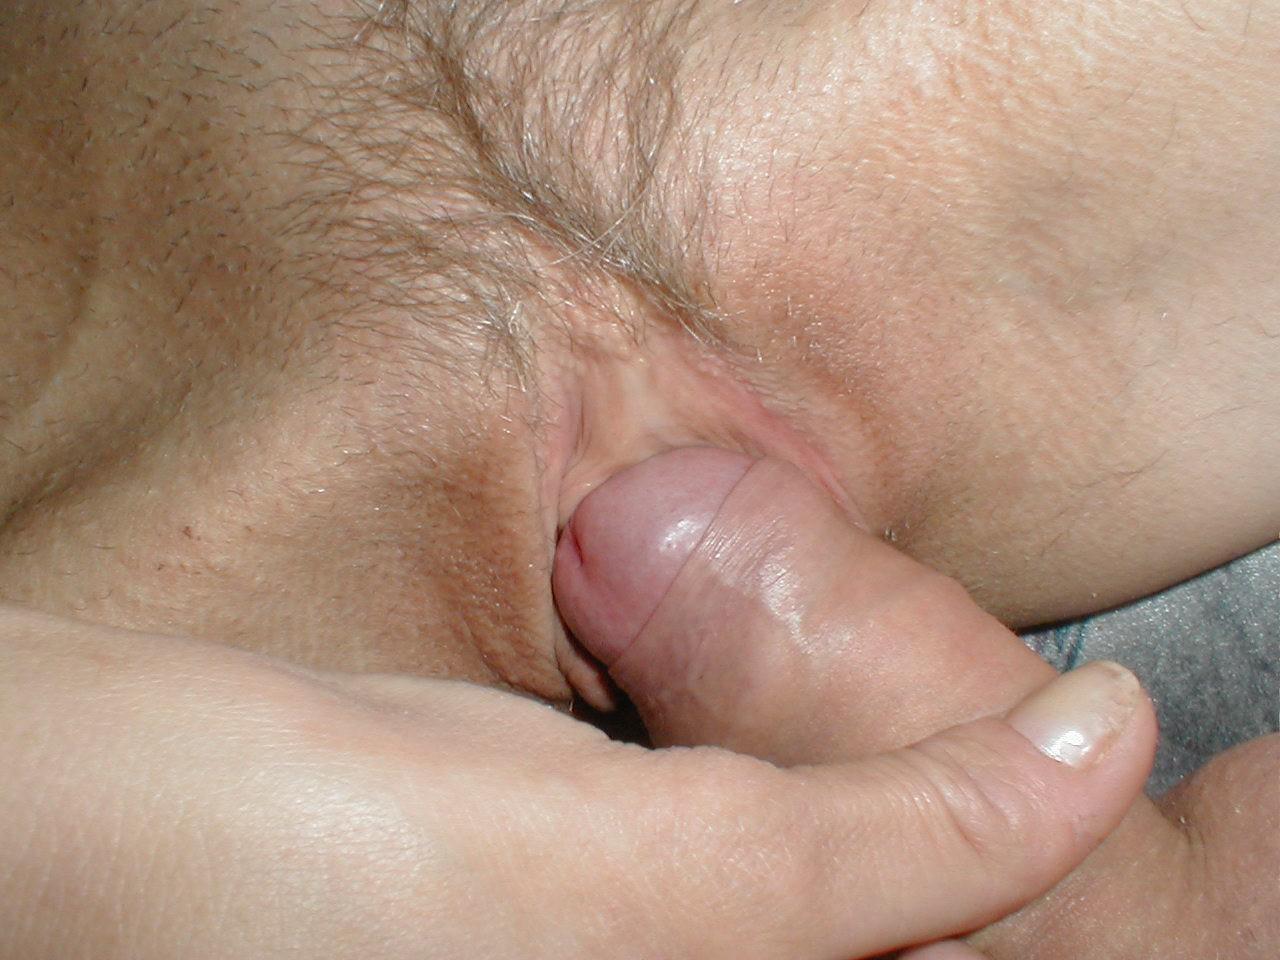 http://pbs-2.adult-empire.com/85/8570/021/pic/4.jpg